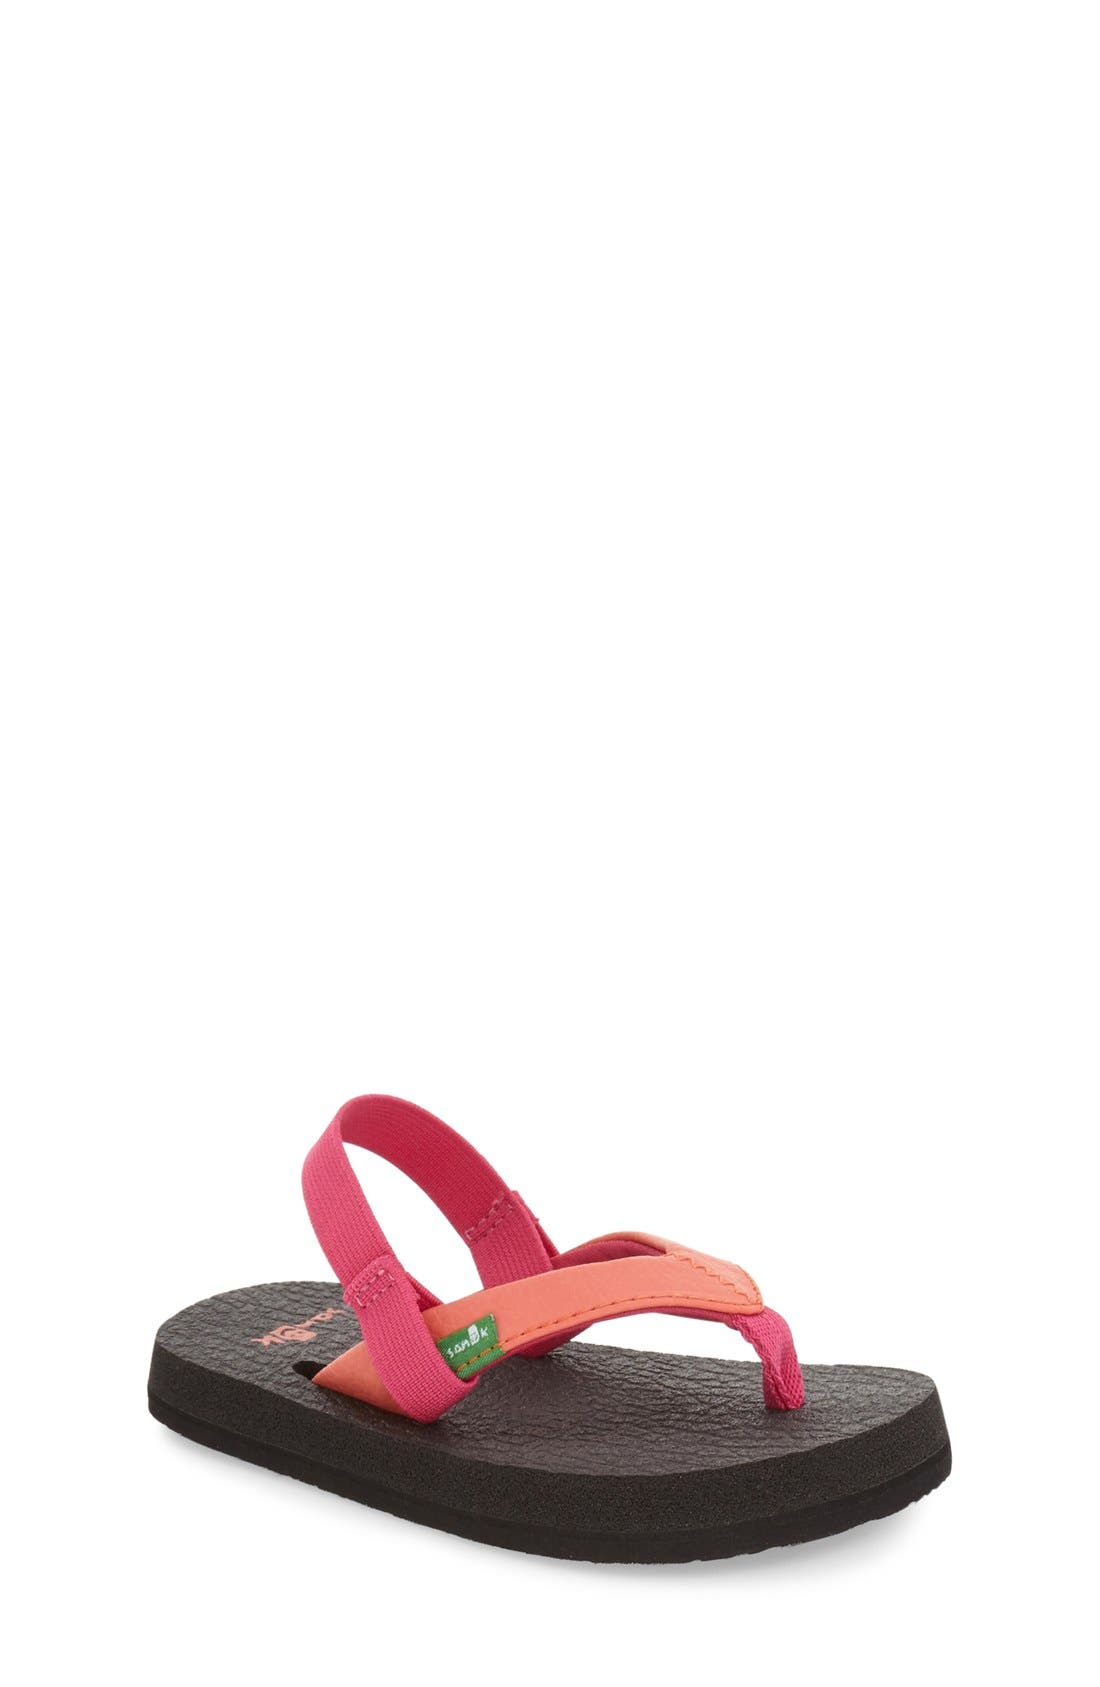 Main Image - Sanuk 'Yoga Mat' Sandal (Toddler, Little Kid & Big Kid)